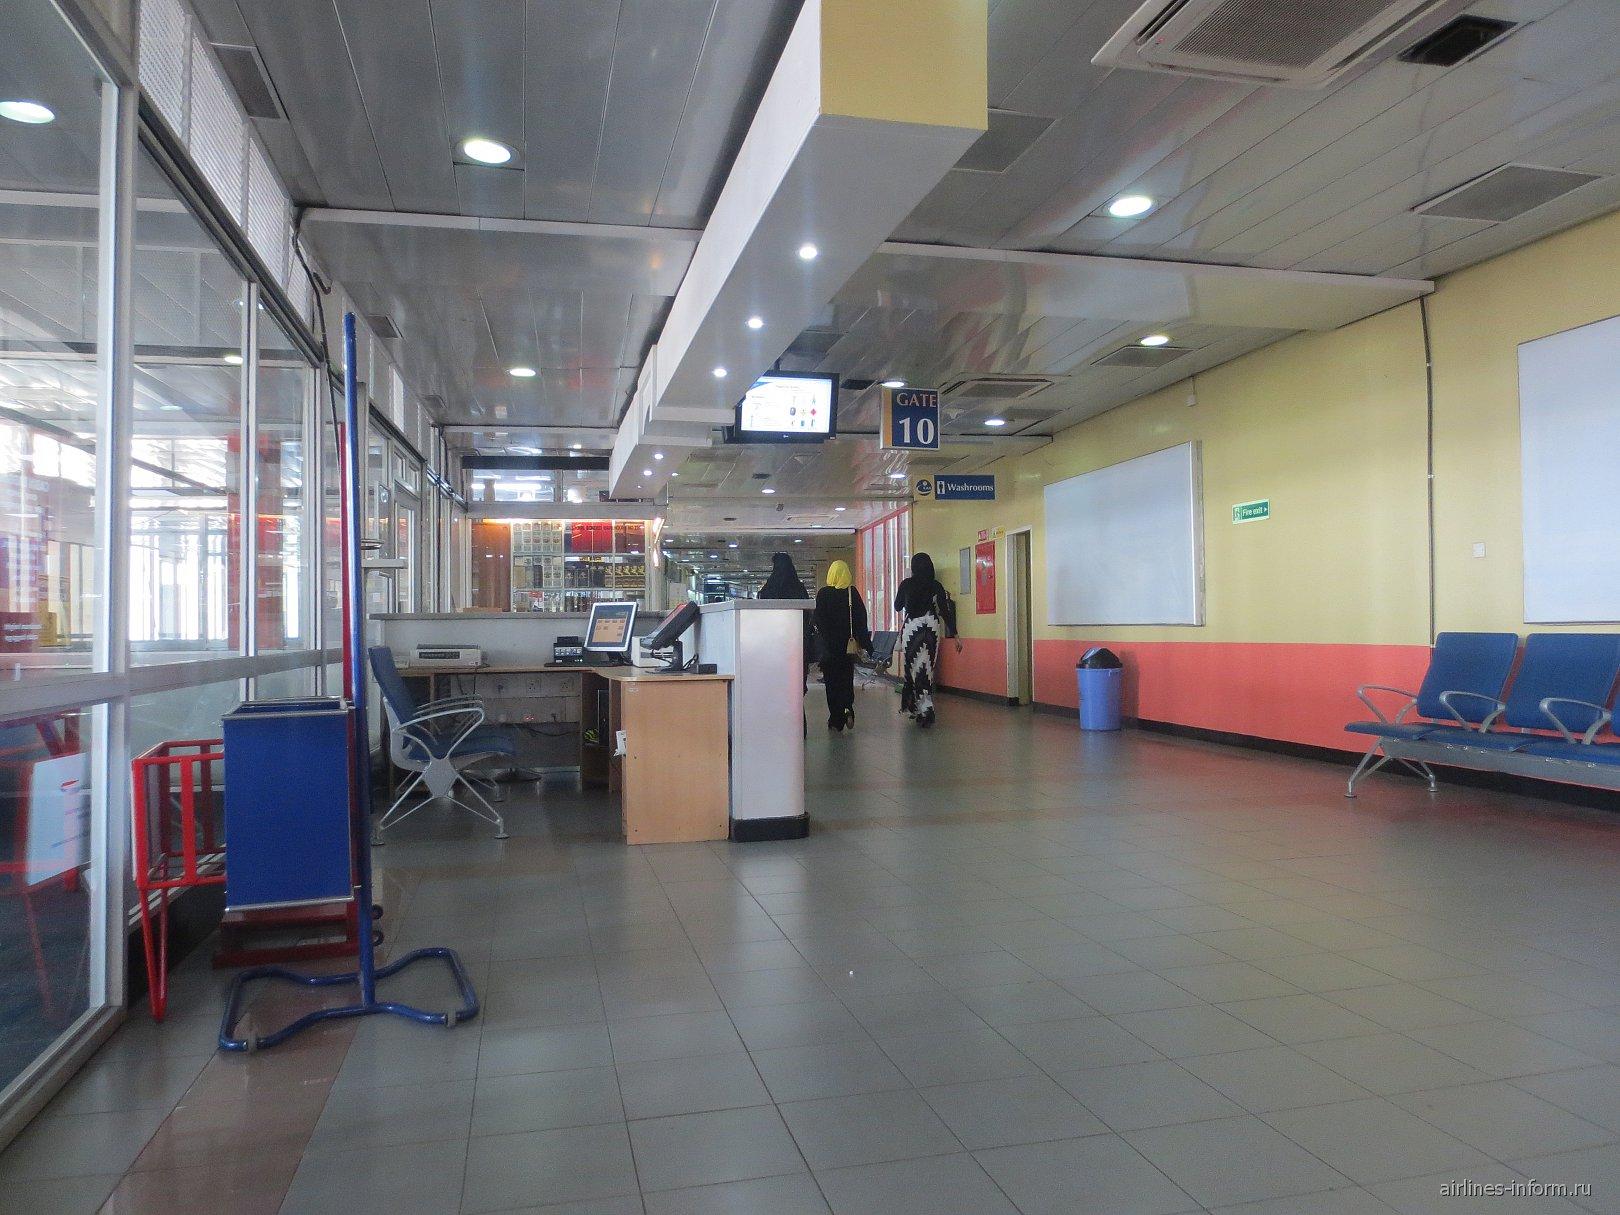 Выход на посадку в аэропорту Найроби Джомо Кеньятта